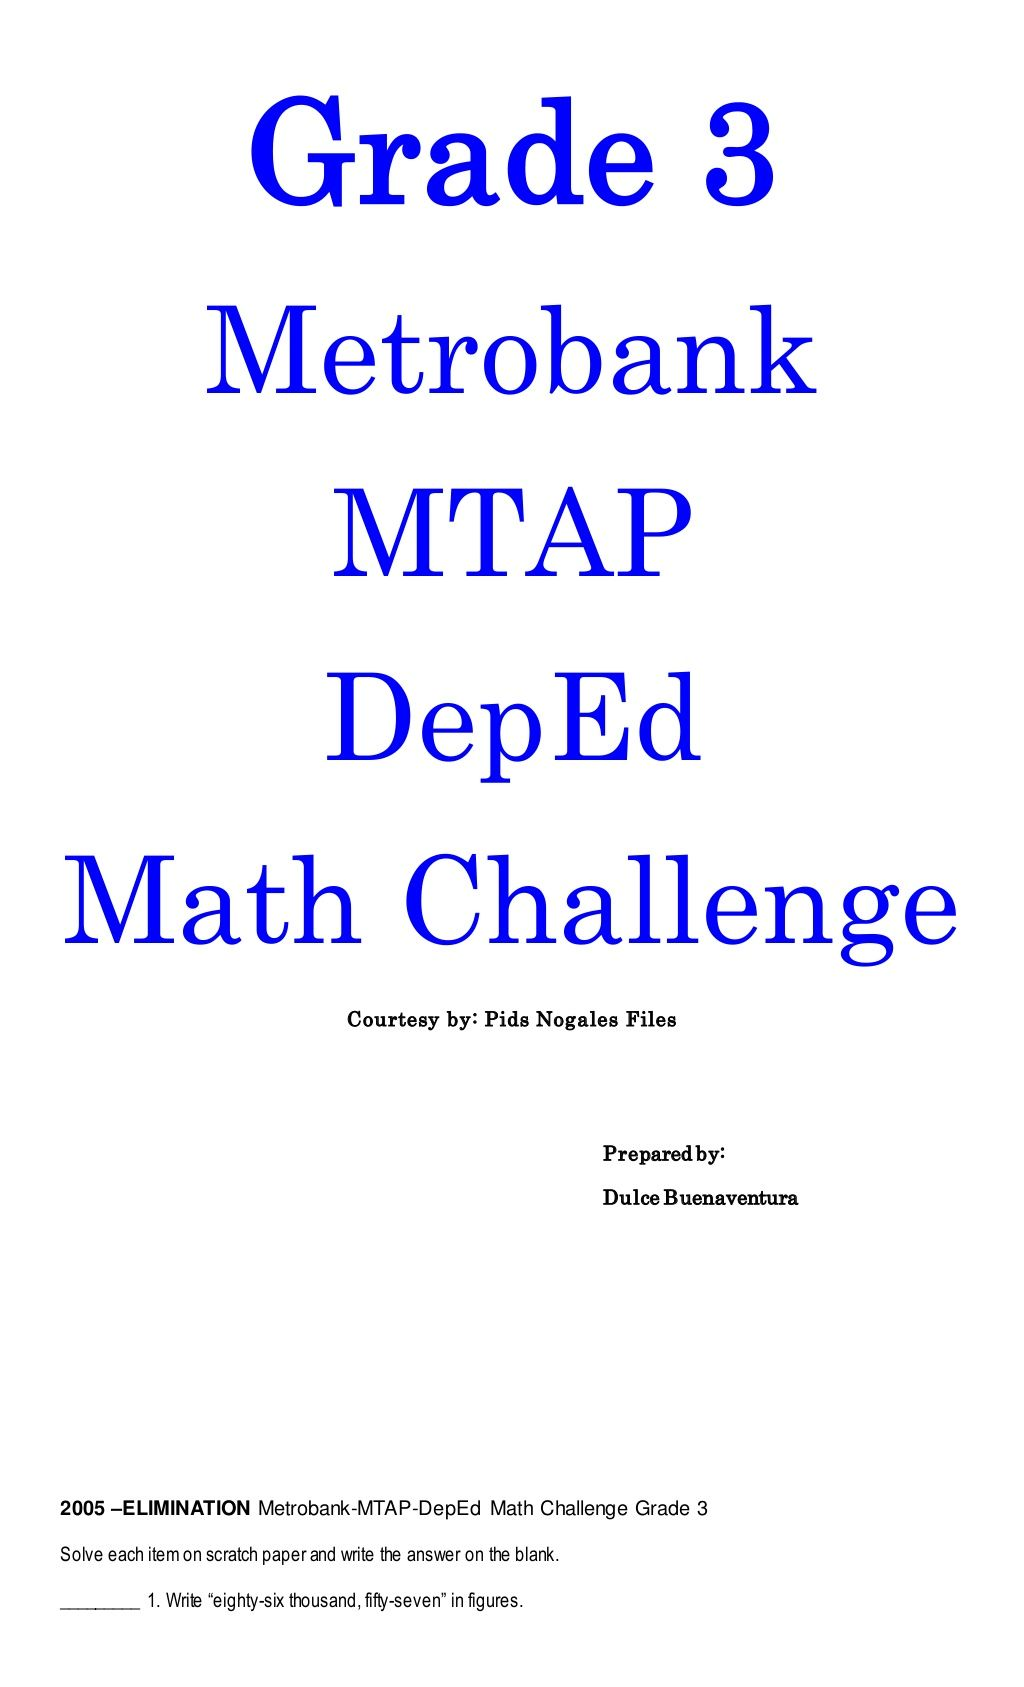 medium resolution of Grade 3 Metrobank MTAP DepEd Math Challenge Courtesy by: Pids Nogales Files  Prepared by: Dulce Buenaventura 2005 –EL…   Math challenge